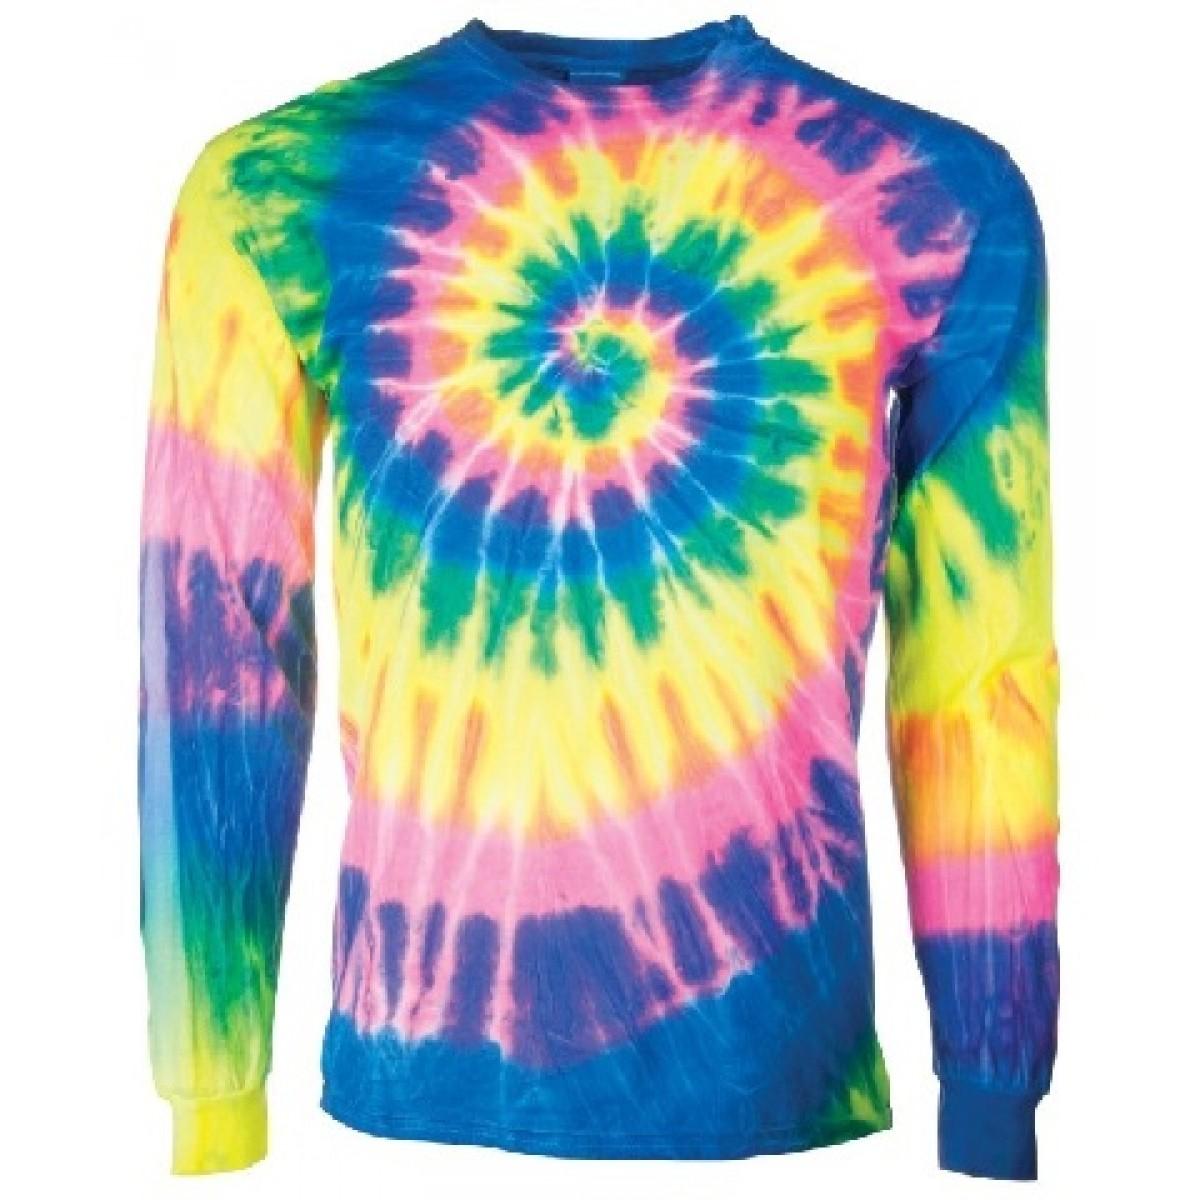 Spiral Tie Dye Long Sleeve Flo Rainbow-Rainbow-S